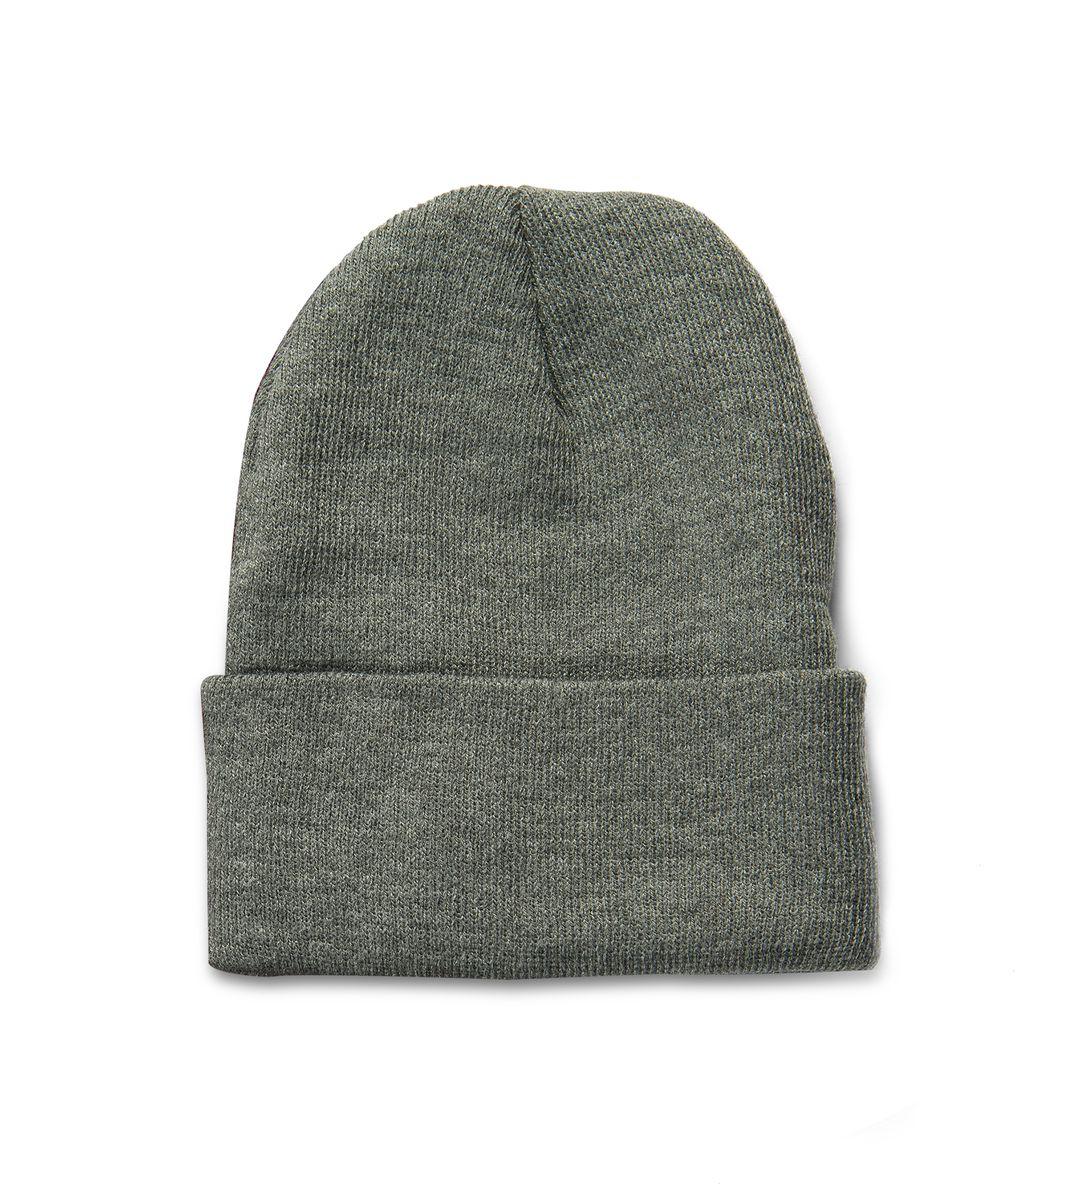 BLACK KNIT CAP